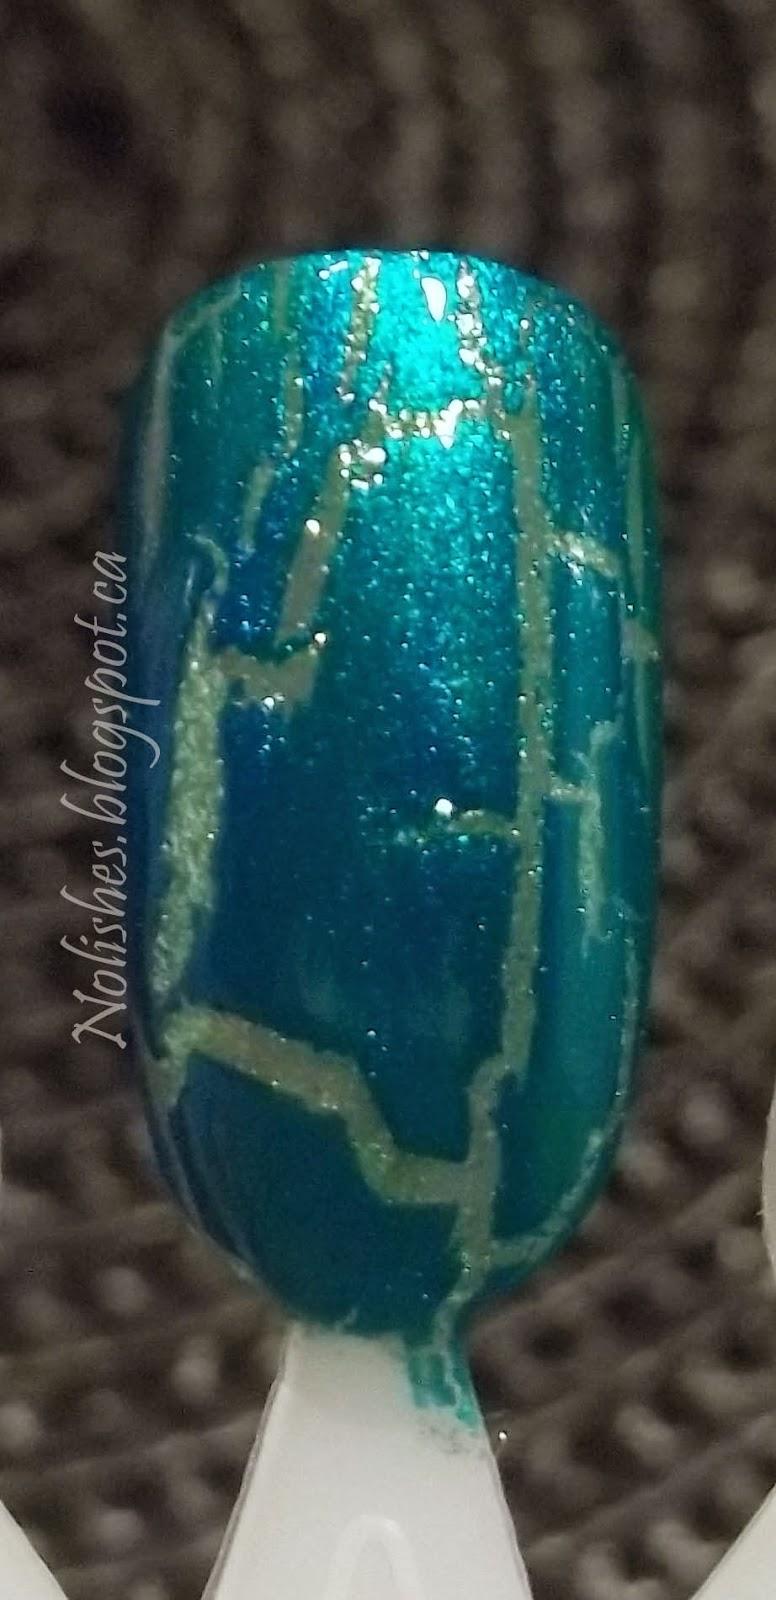 Crackle Base Using OPI 'Turquoise Shatter', and Finger Paints 'Margarita Mambo'